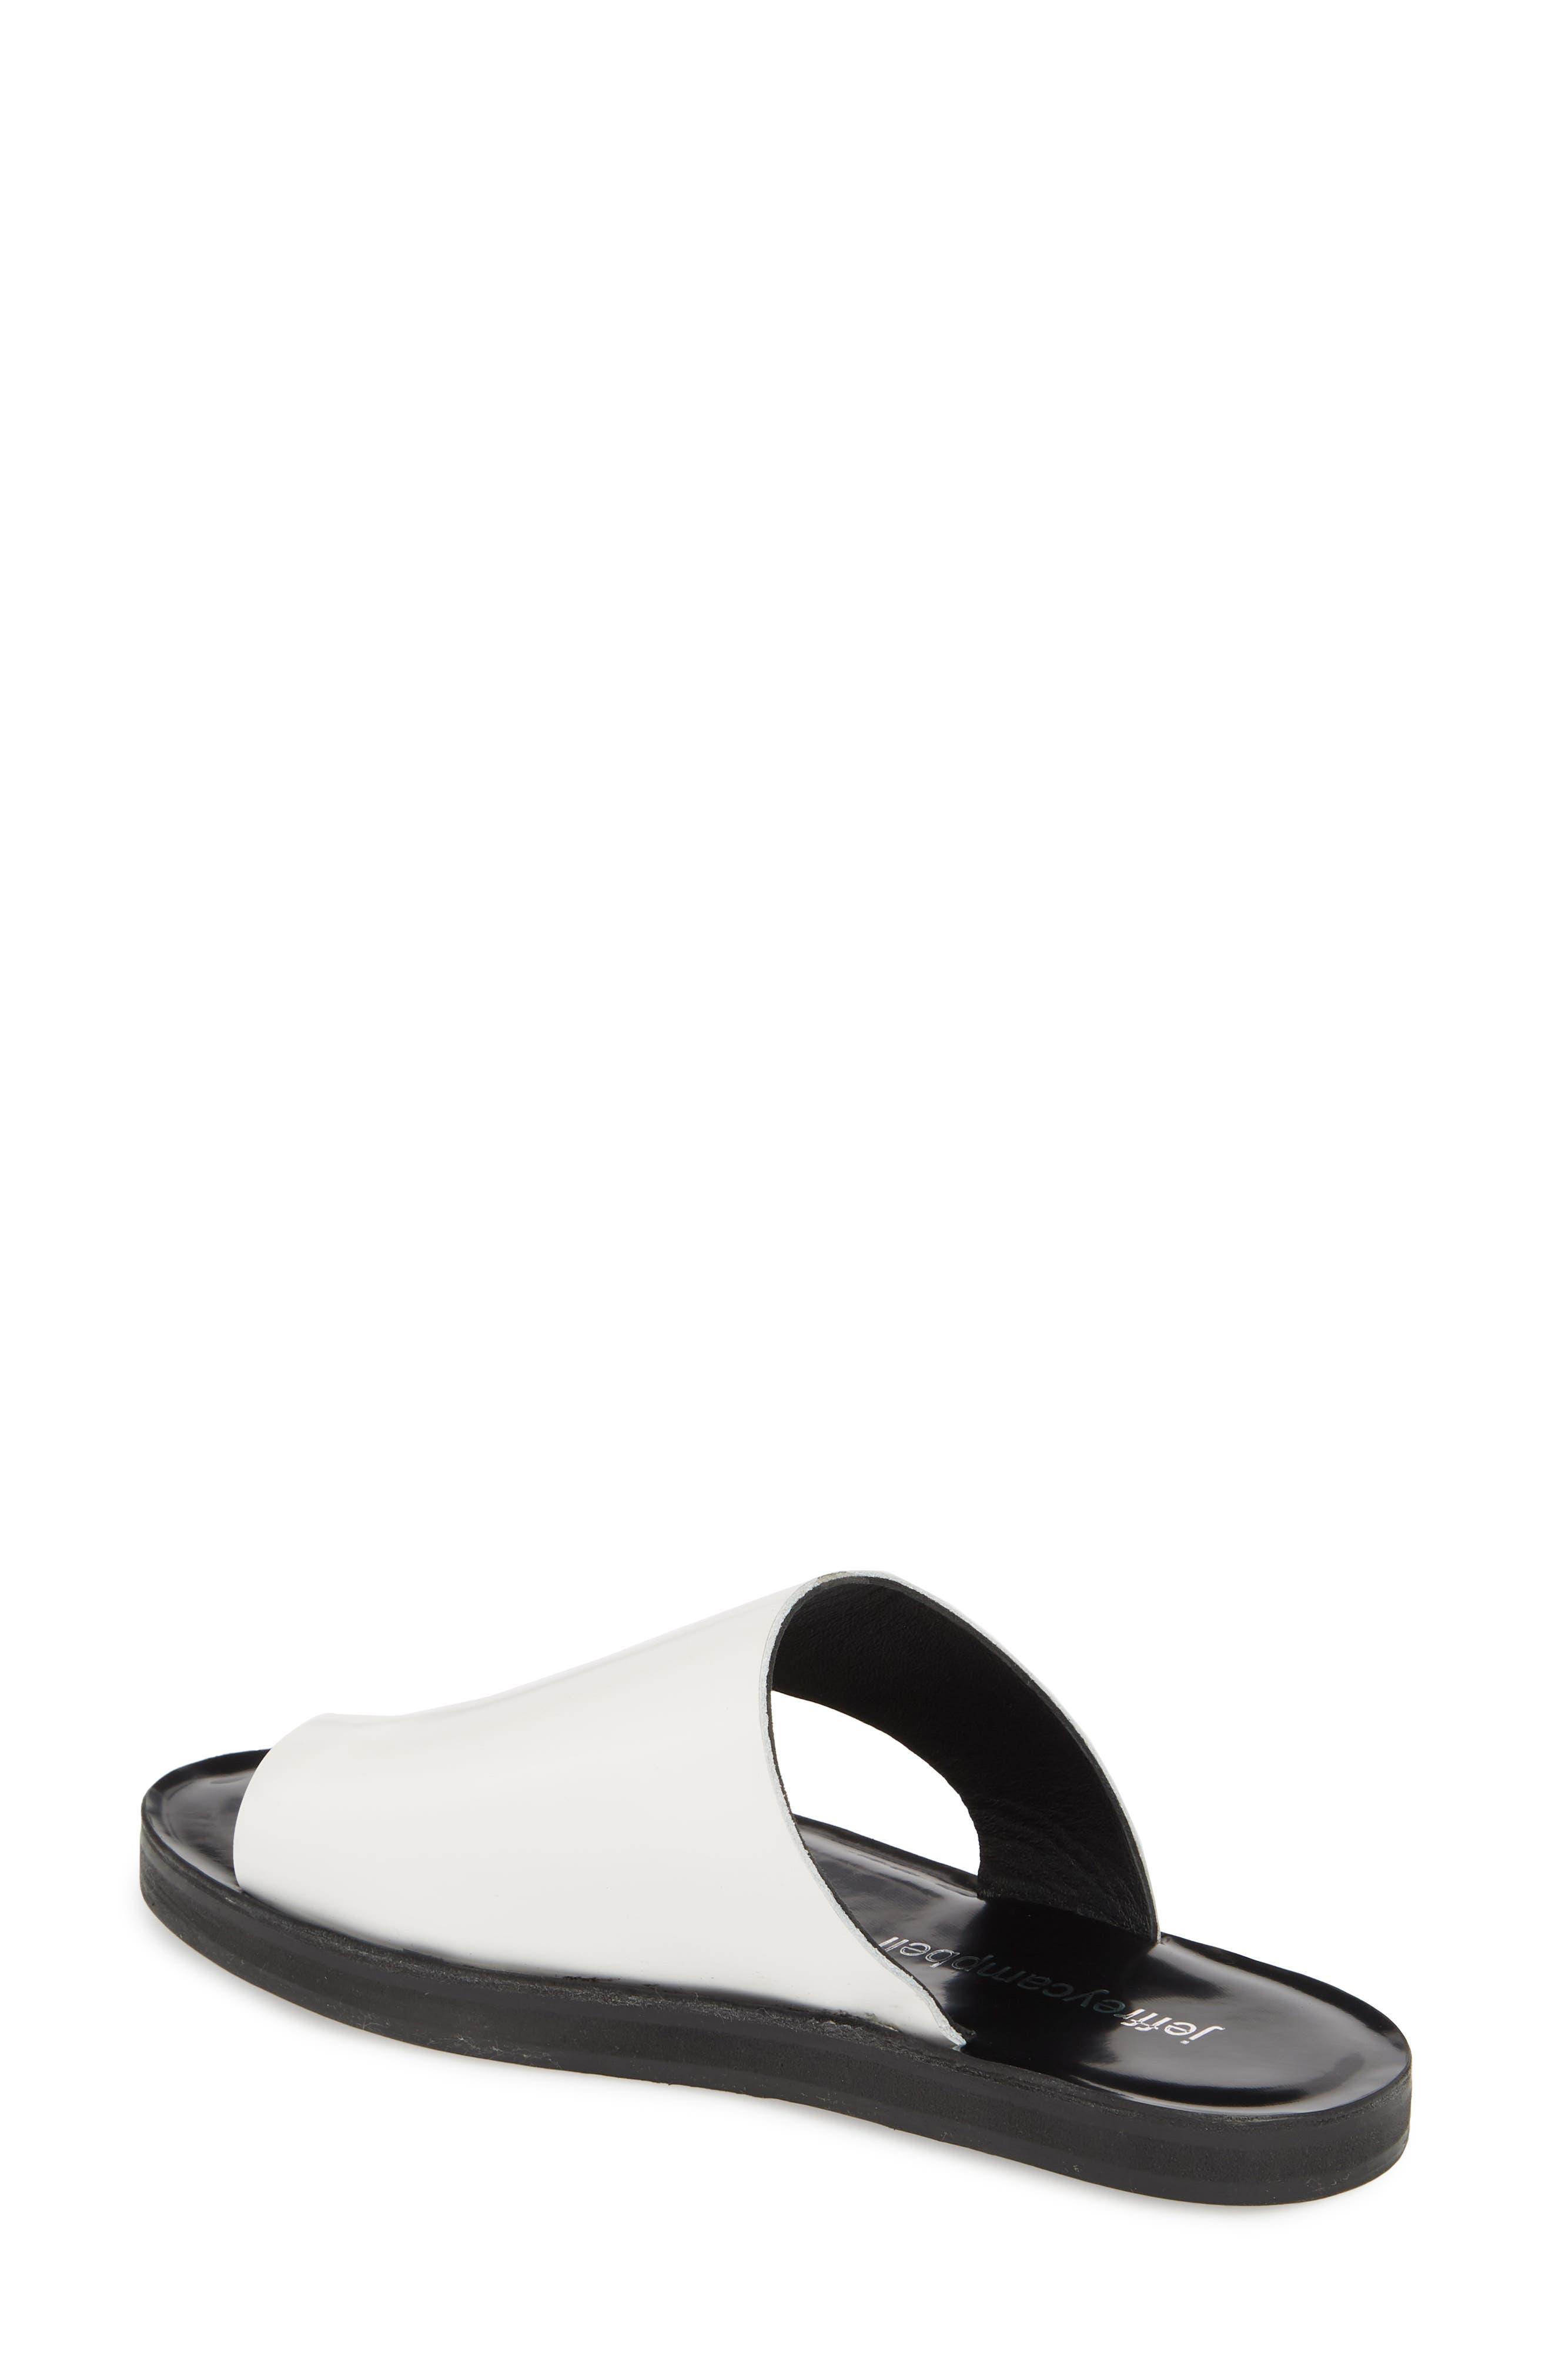 Morada Asymmetrical Slide Sandal,                             Alternate thumbnail 2, color,                             107